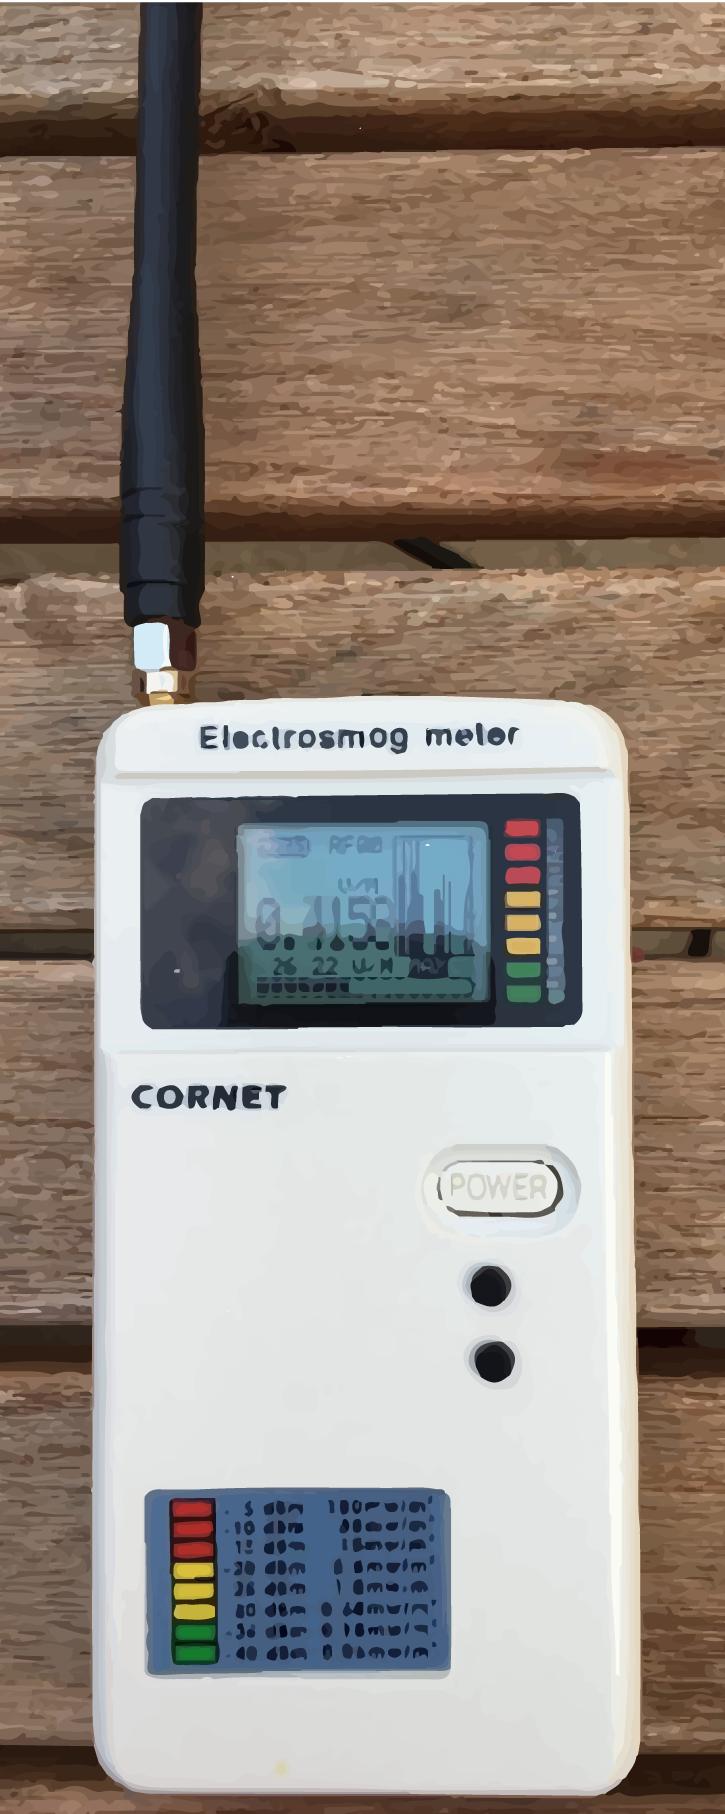 Electrosmog meter SICEM